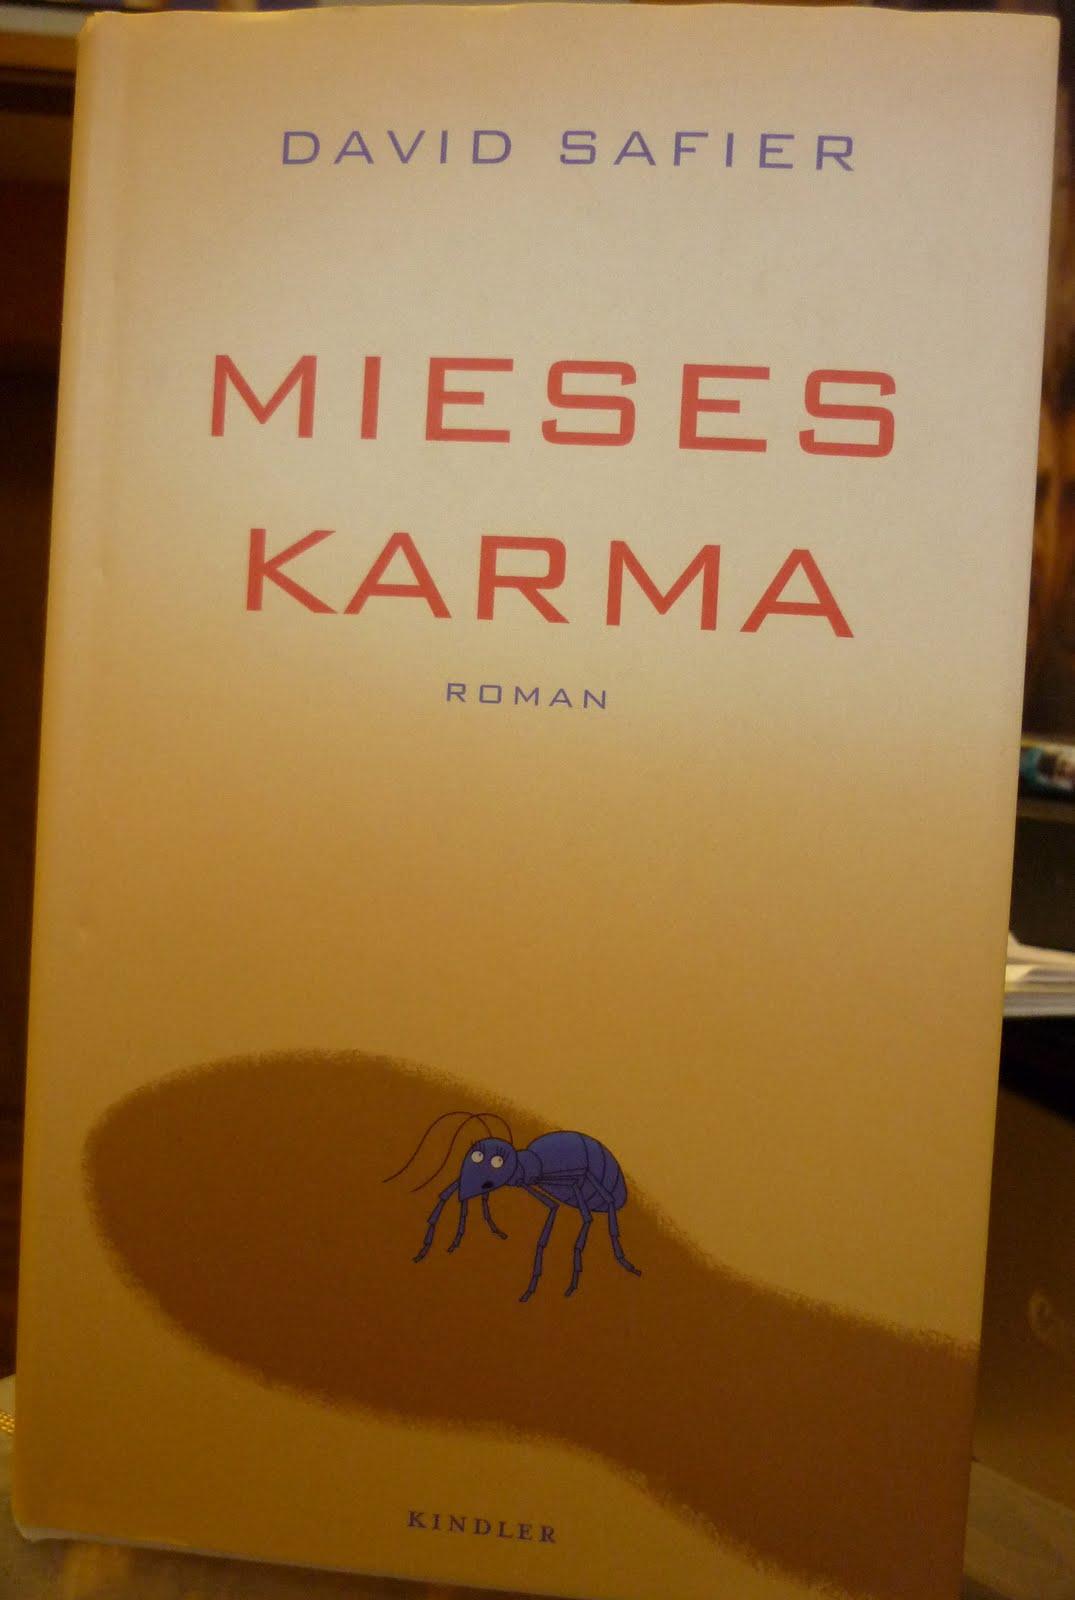 Miese Karma